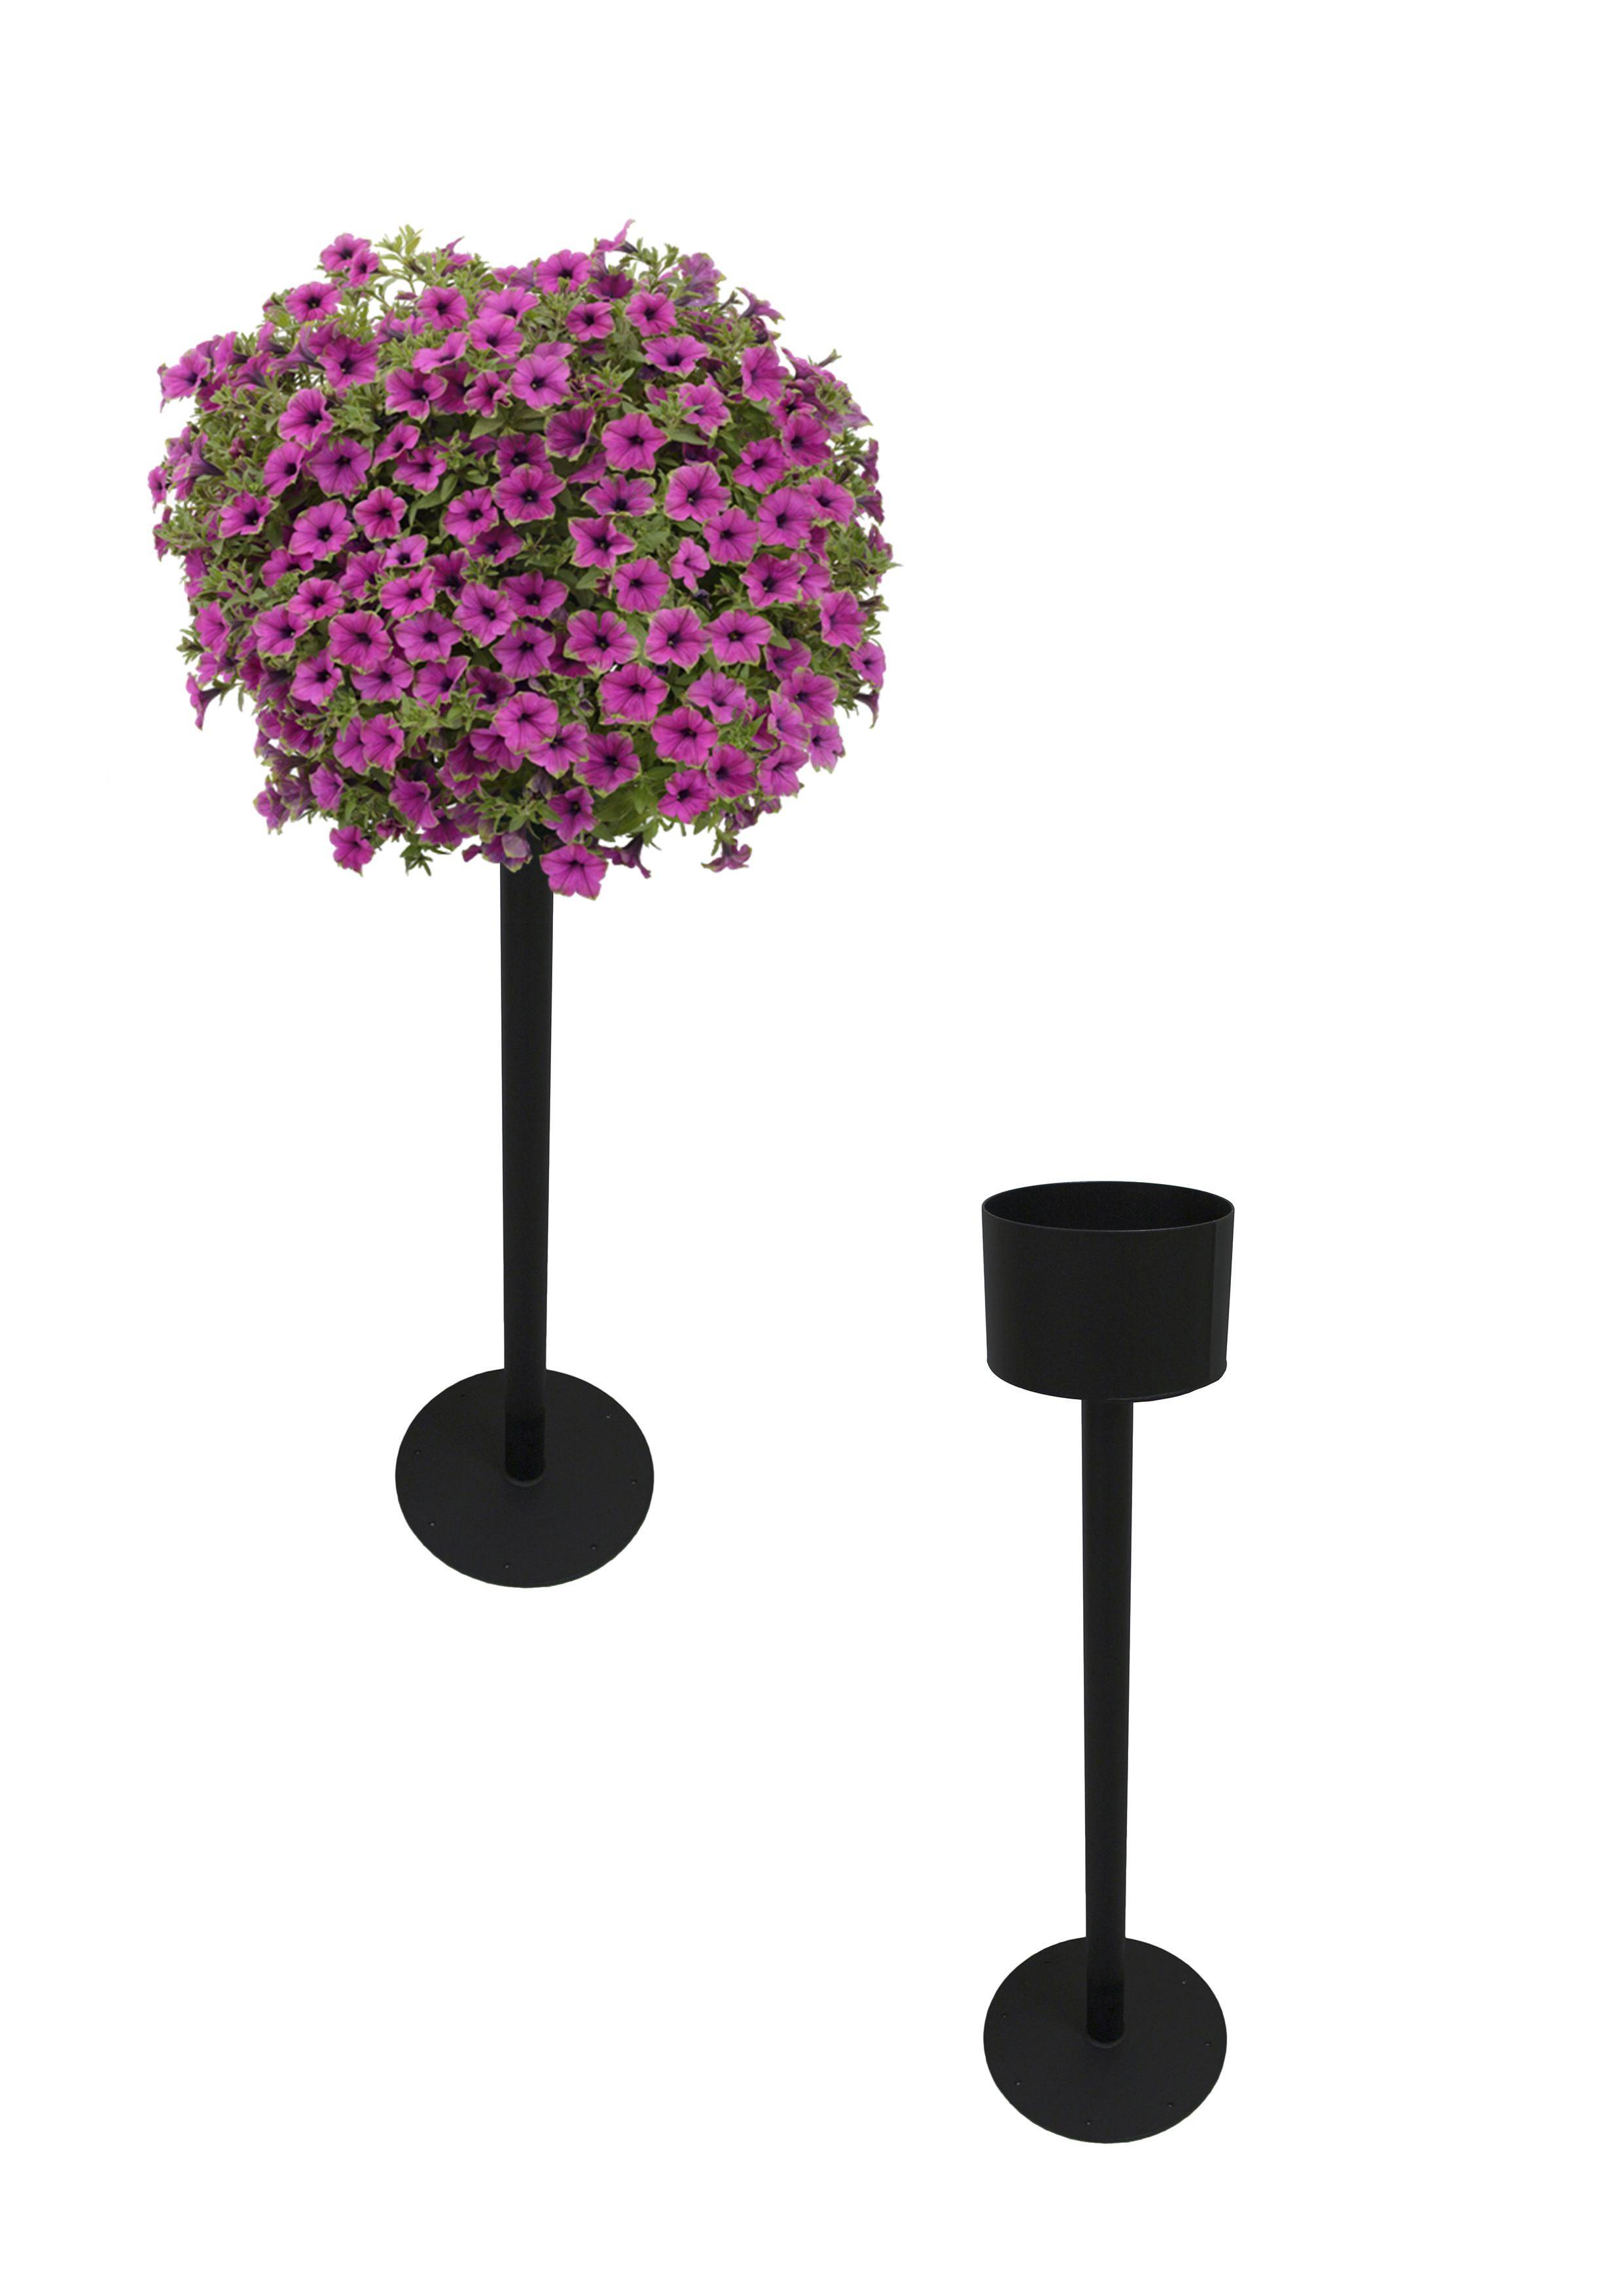 Ampli post, kõrgus 150cm + tald 40 cm